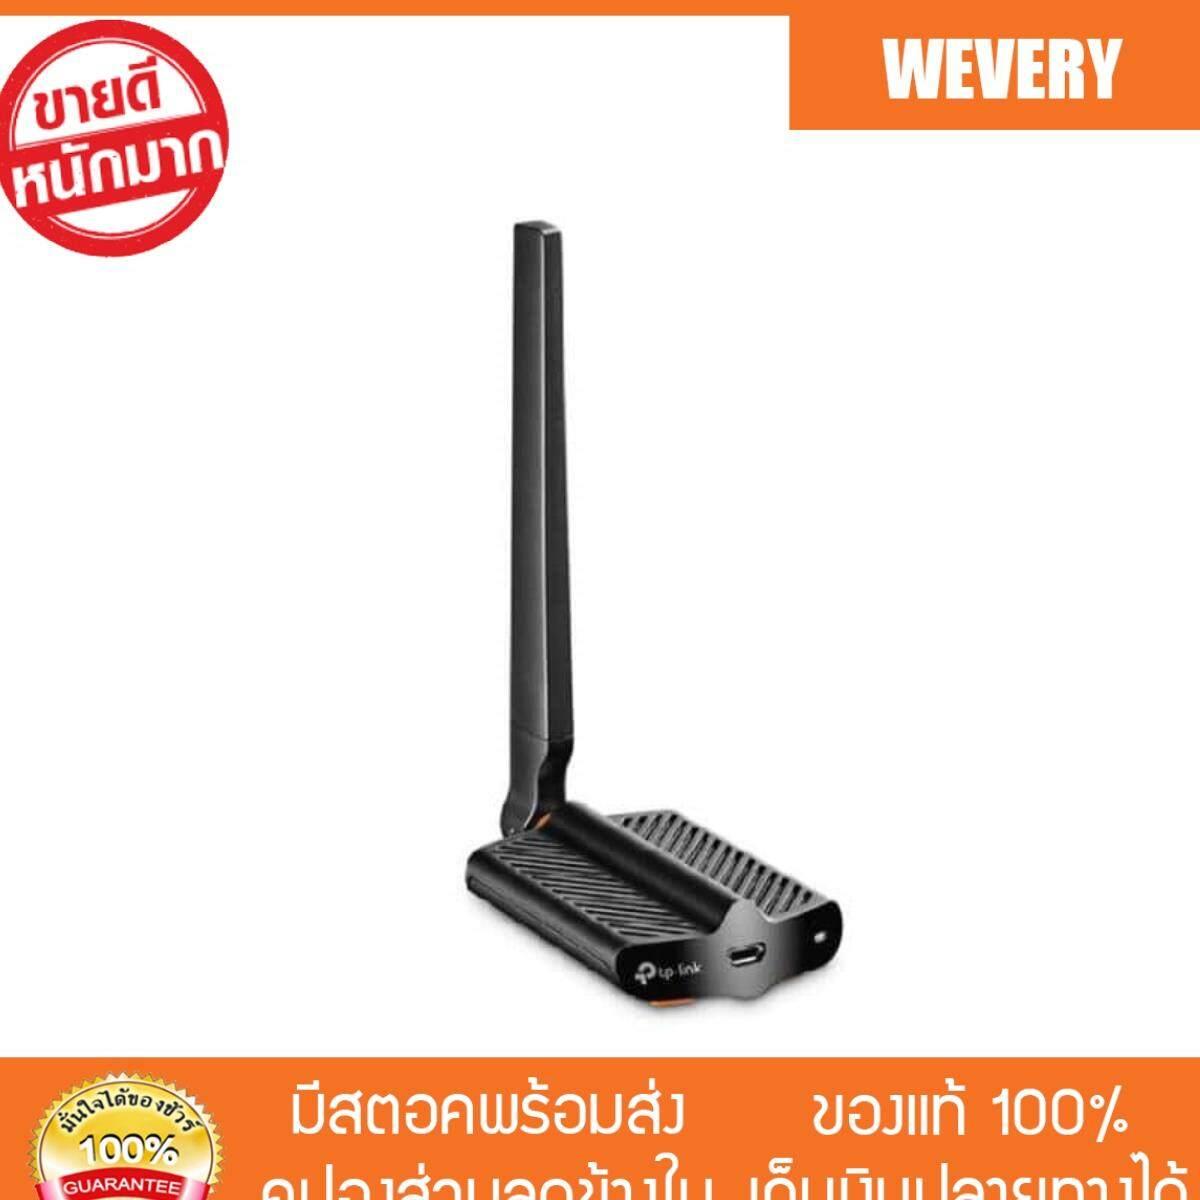 [Wevery] TP-Link Archer T2UHP อุปกรณ์รับ Wi-Fi (AC600 High Power Wireless Dual Band USB Adapter) ตัวรับสัญญาณ wifi ตัวรับ wifi ส่ง Kerry เก็บปลายทางได้